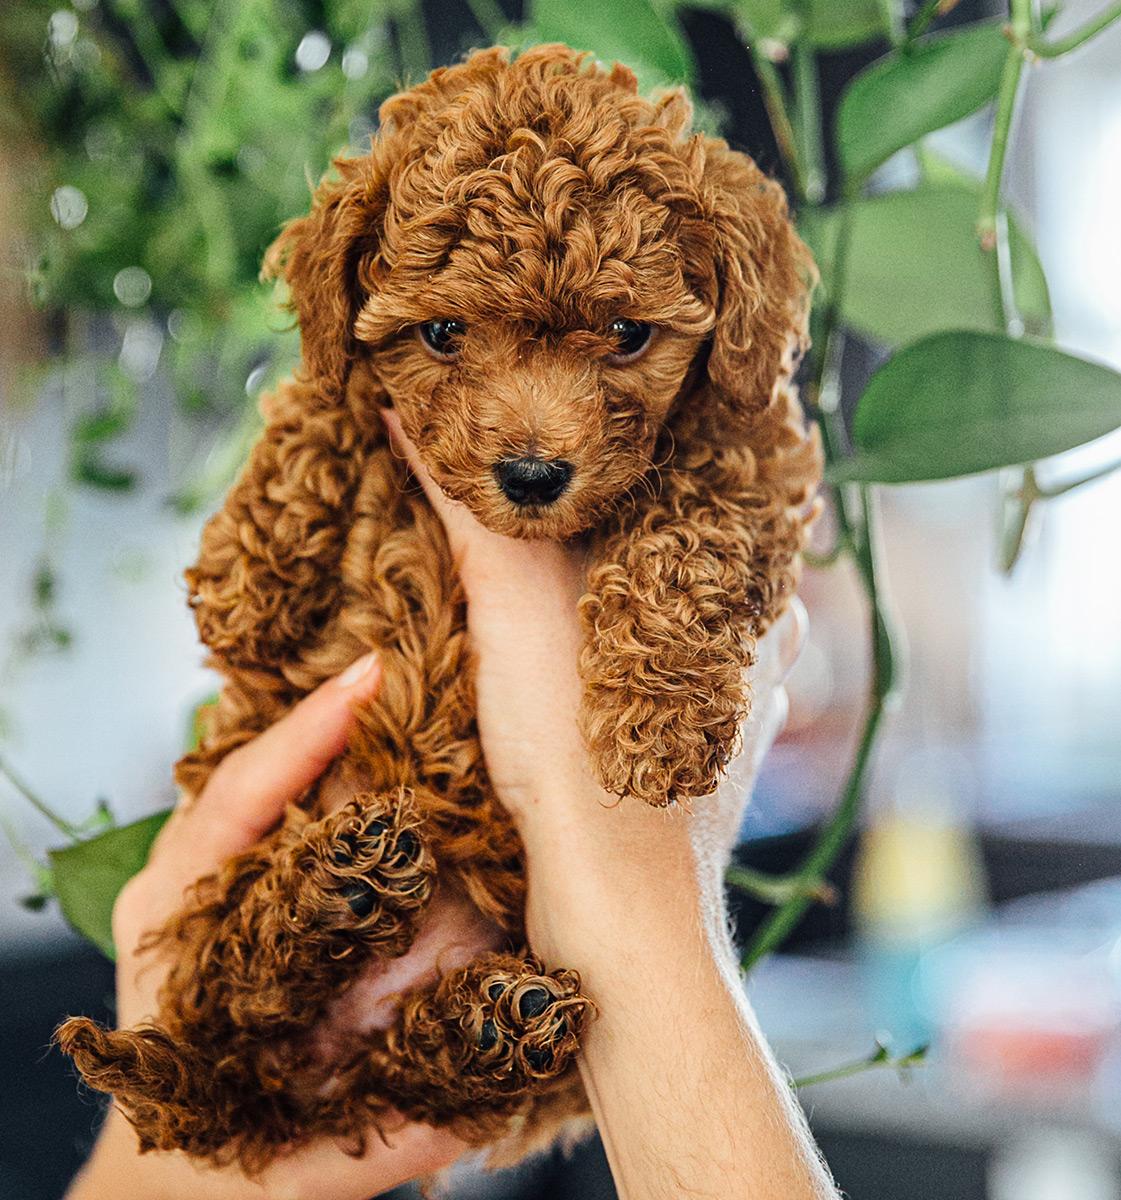 Cute Mini Goldendoodle puppy